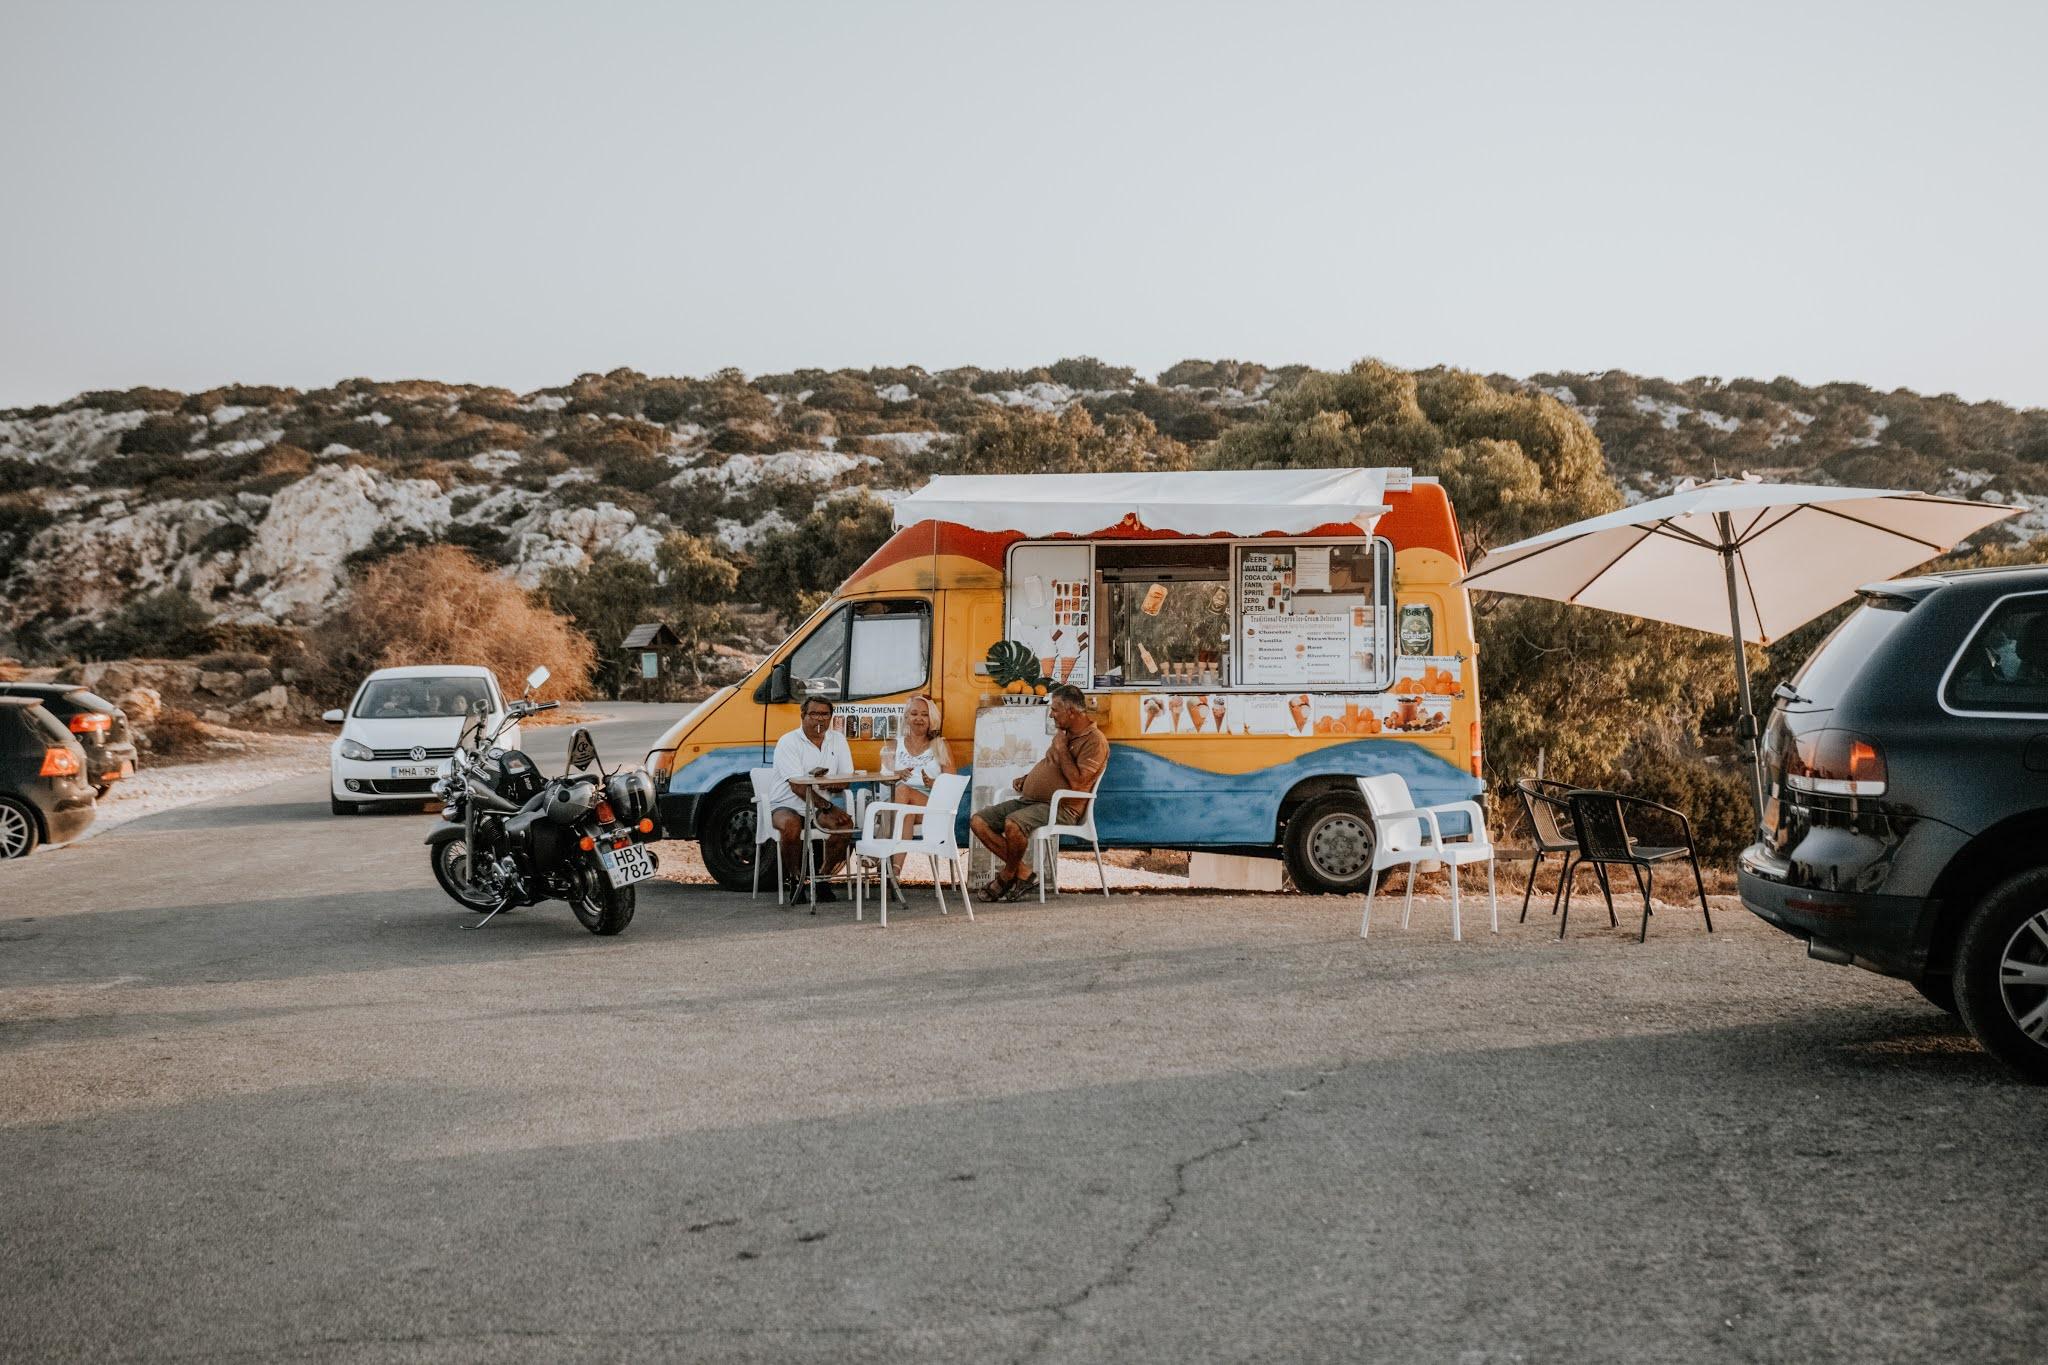 Knajpka na Cape Greco, atrakcje Cypru